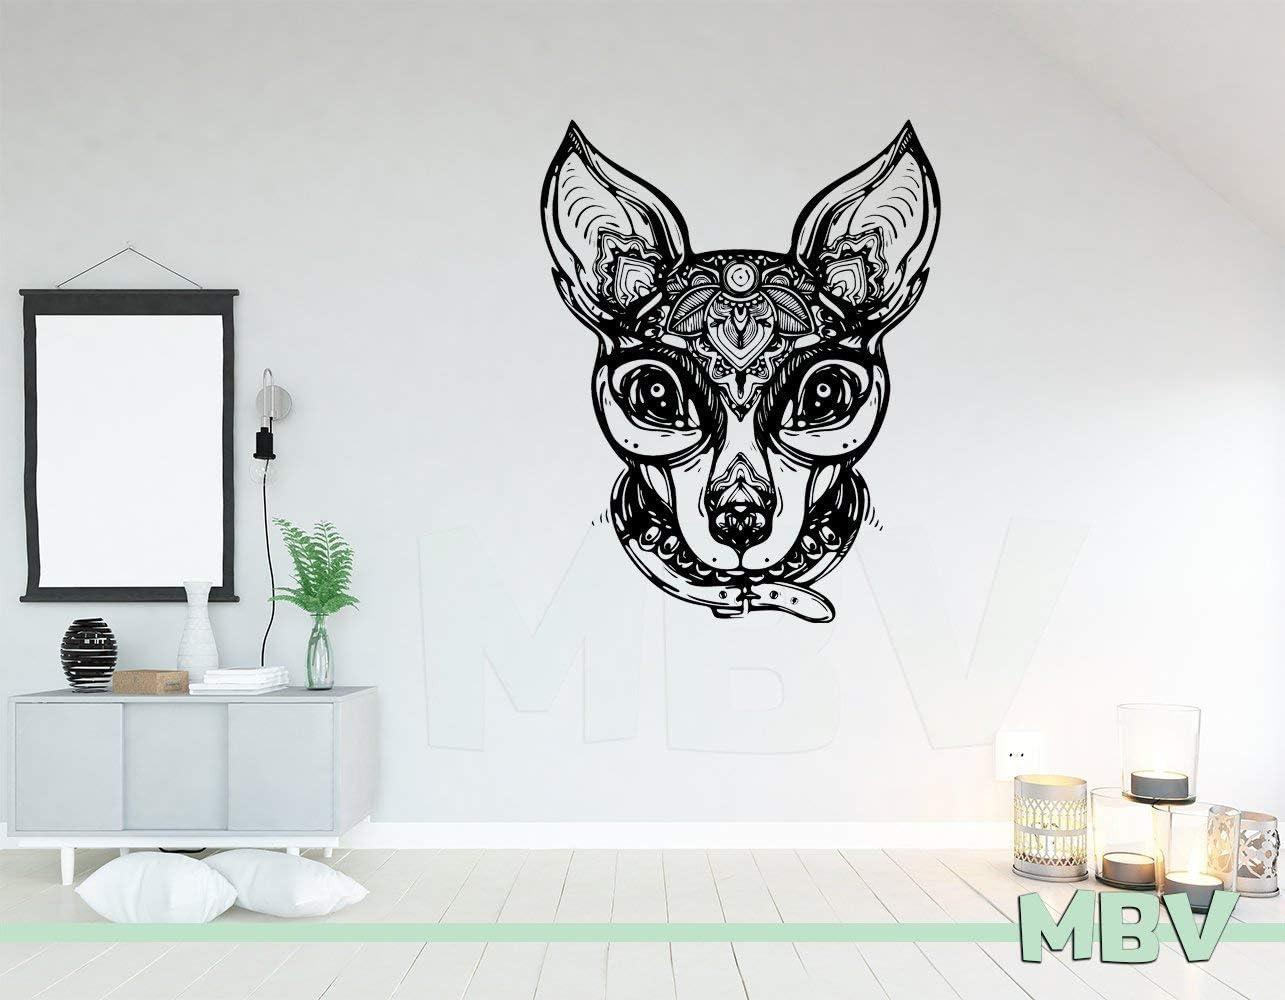 Mandala Dog Decal - Chihuahua Dog Wall Art - Chihuahua Wall Decor - Chihuahua with Collar Vinyl Sticker Mexican Dog Made in USA